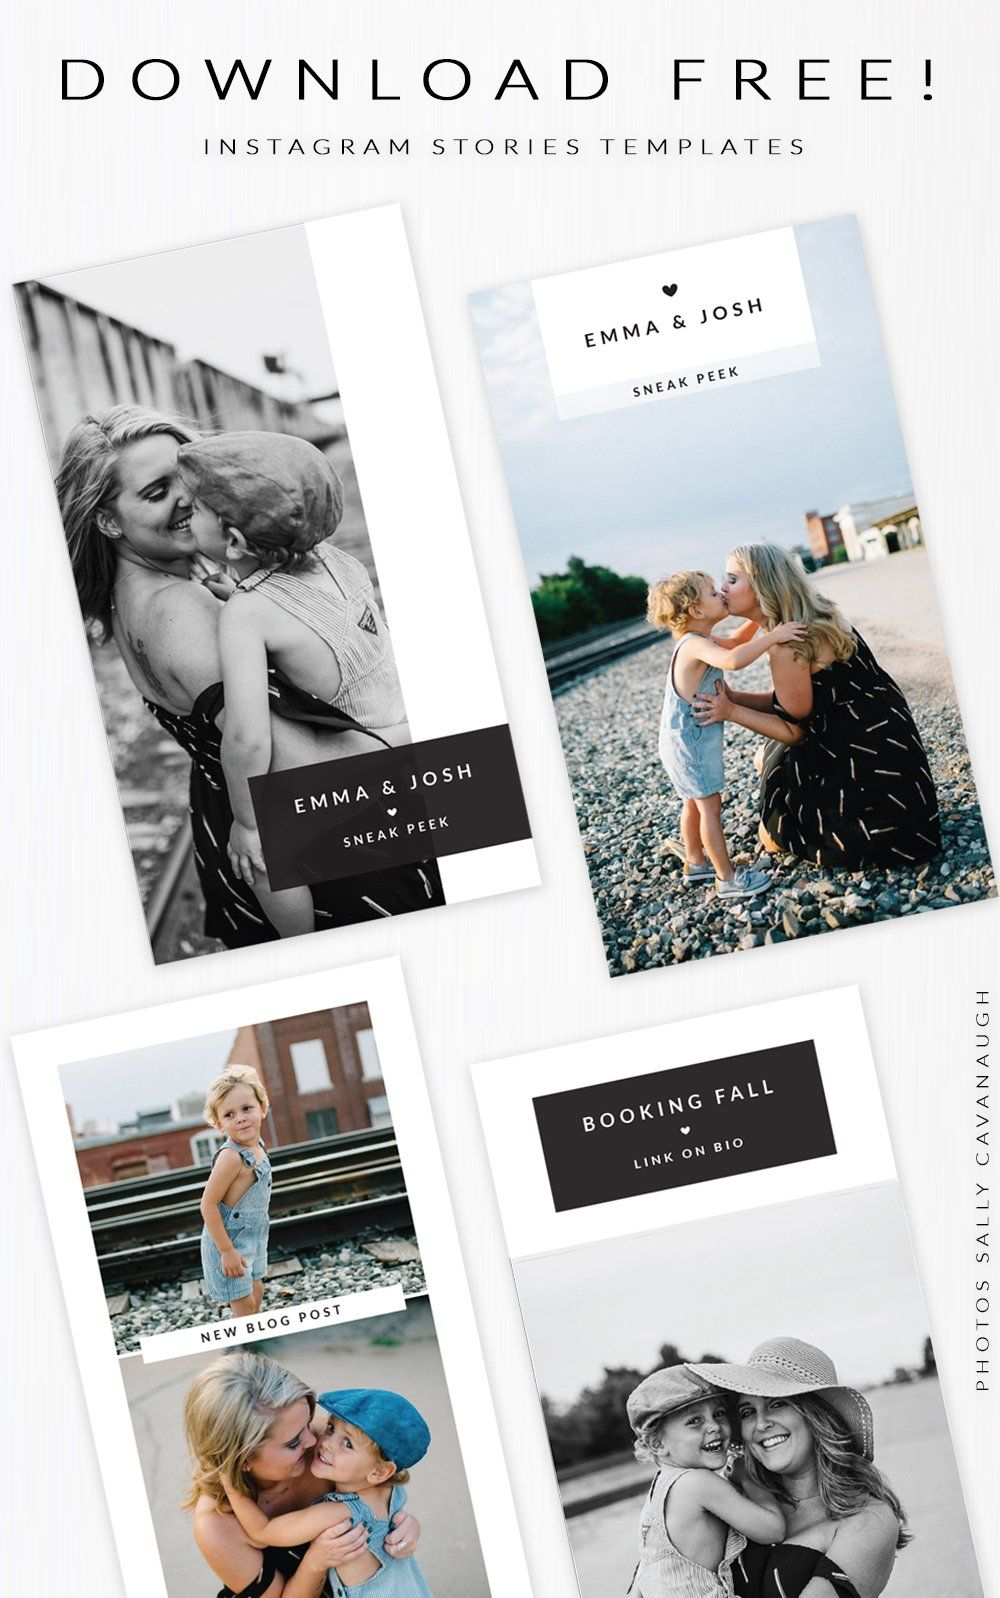 October Freebie - Instagram Stories templates | Pinterest | Free ...